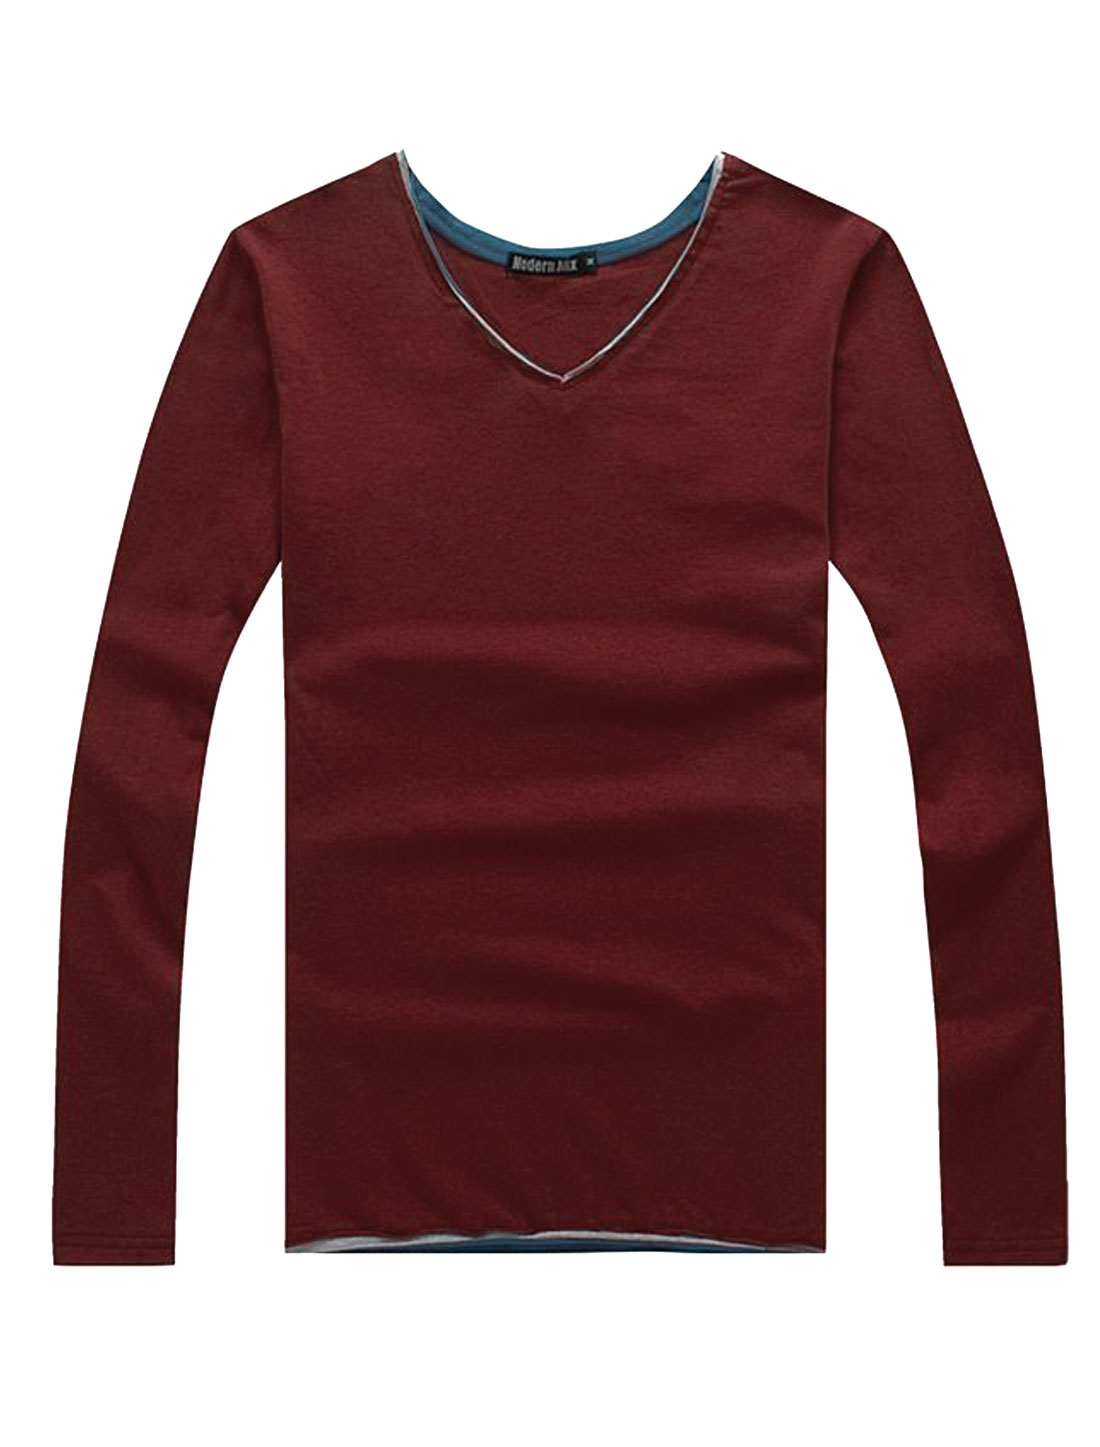 Soft Patched Detail Slipover Design Casual Shirt for Men Burgundy M